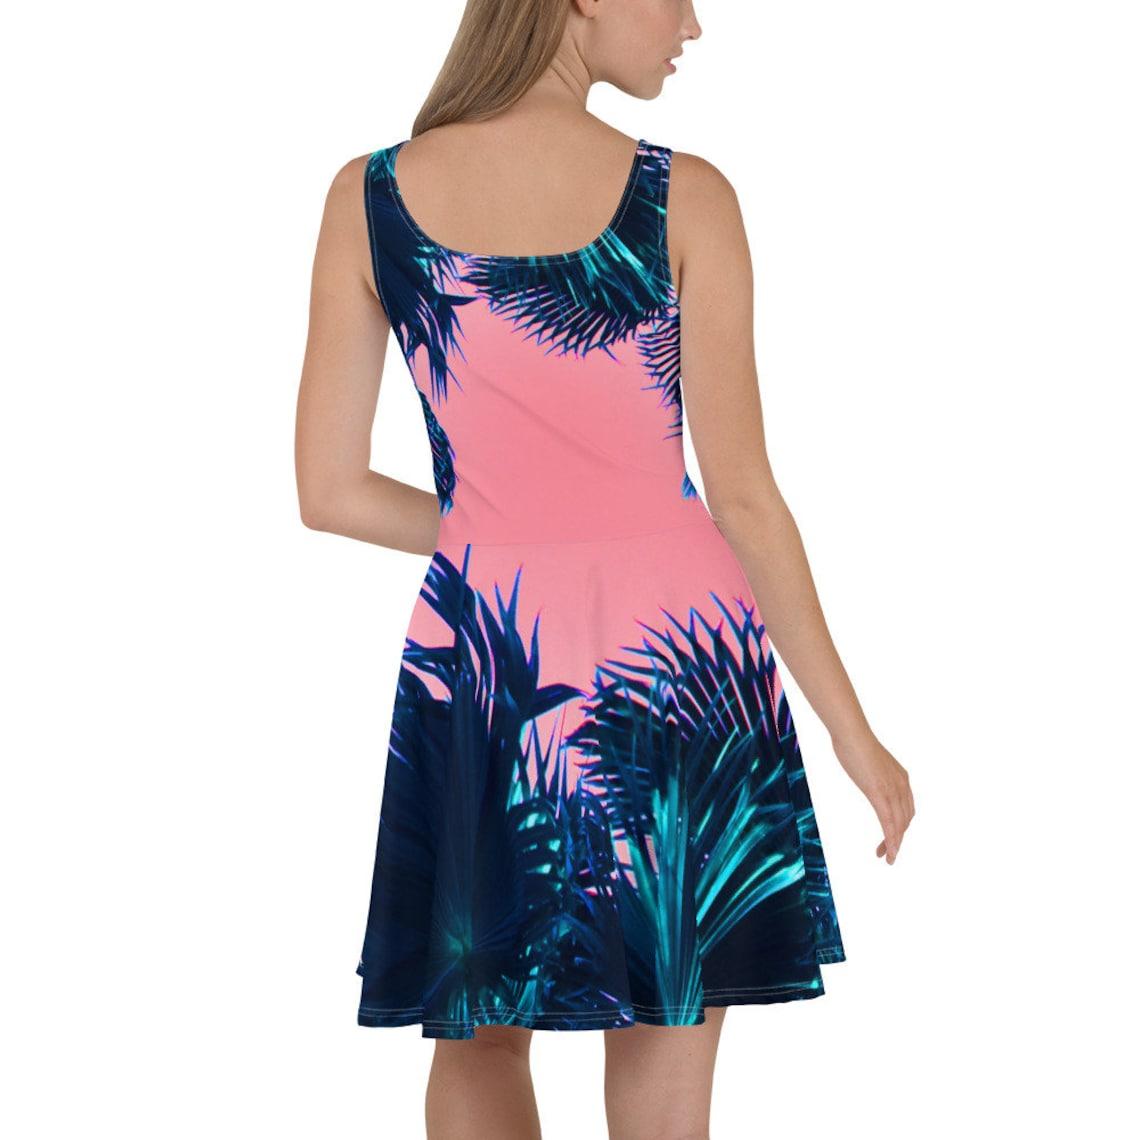 Park Avenue Skater Dress